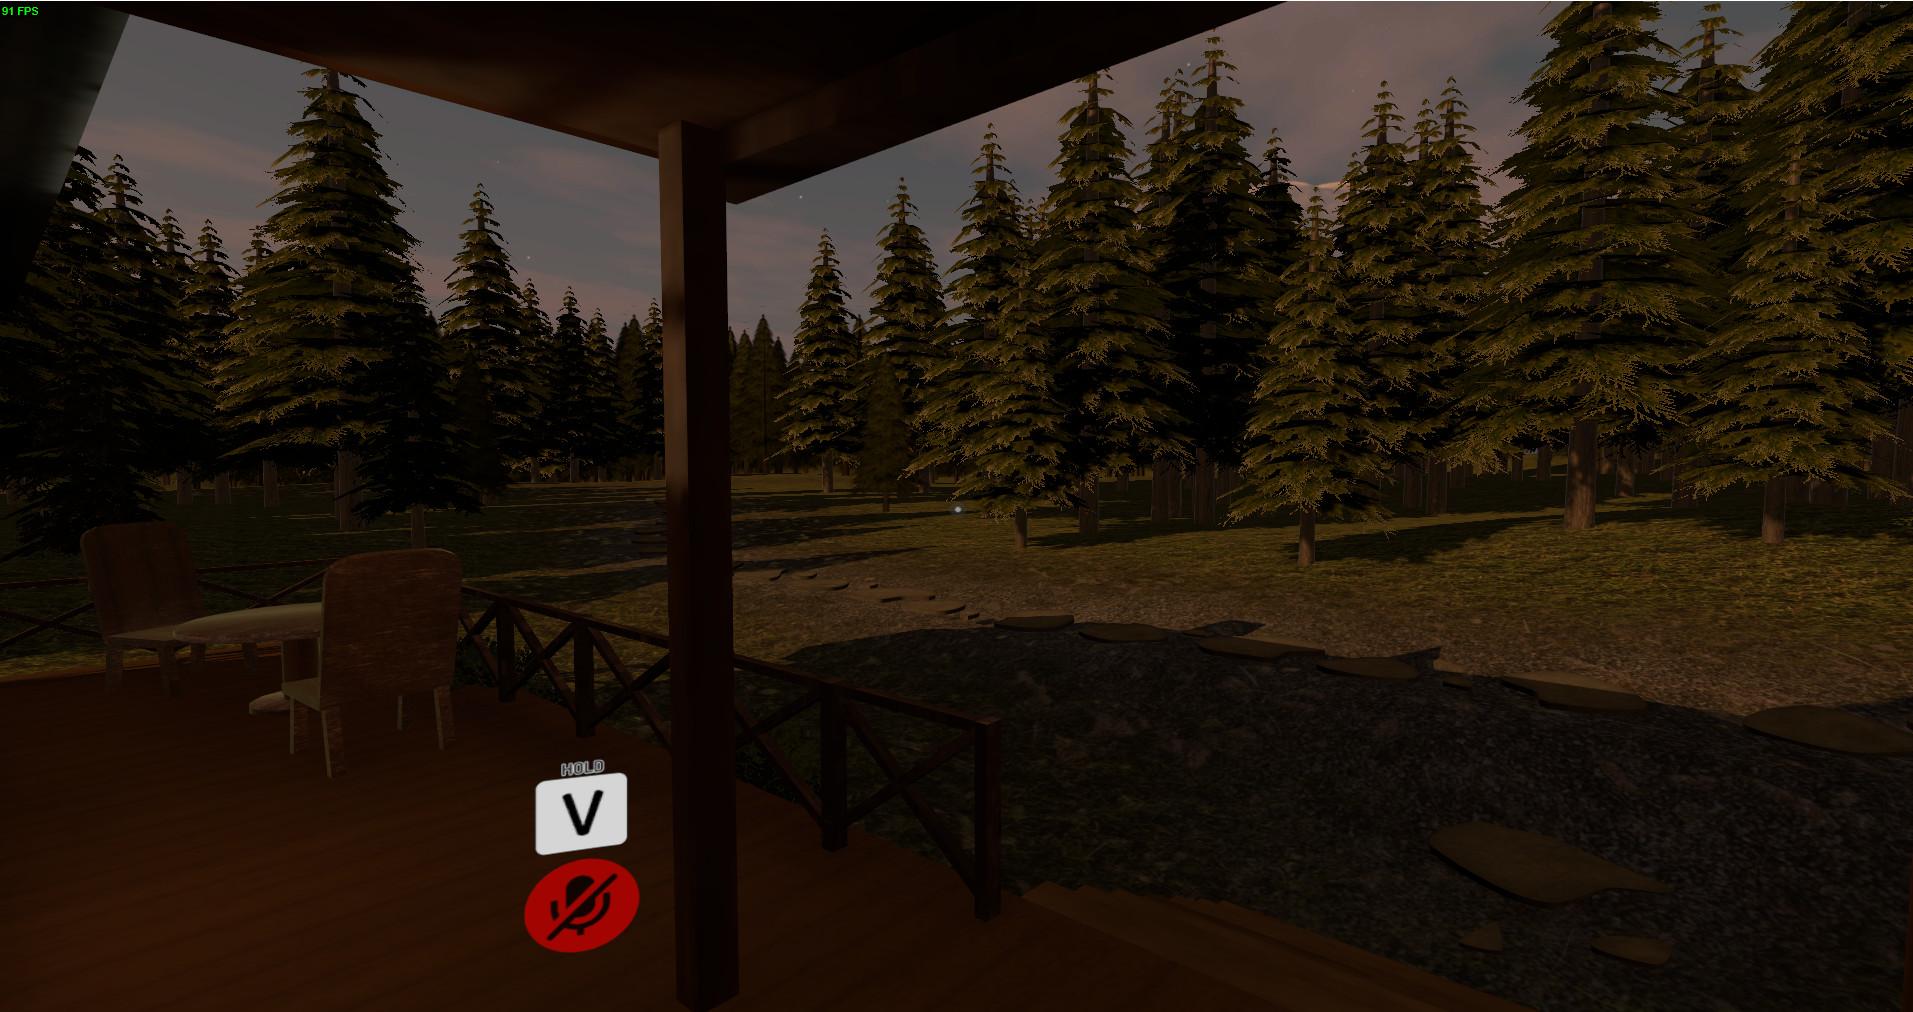 ArtStation - SAO Forest House VRchat World, Benjamin Griere